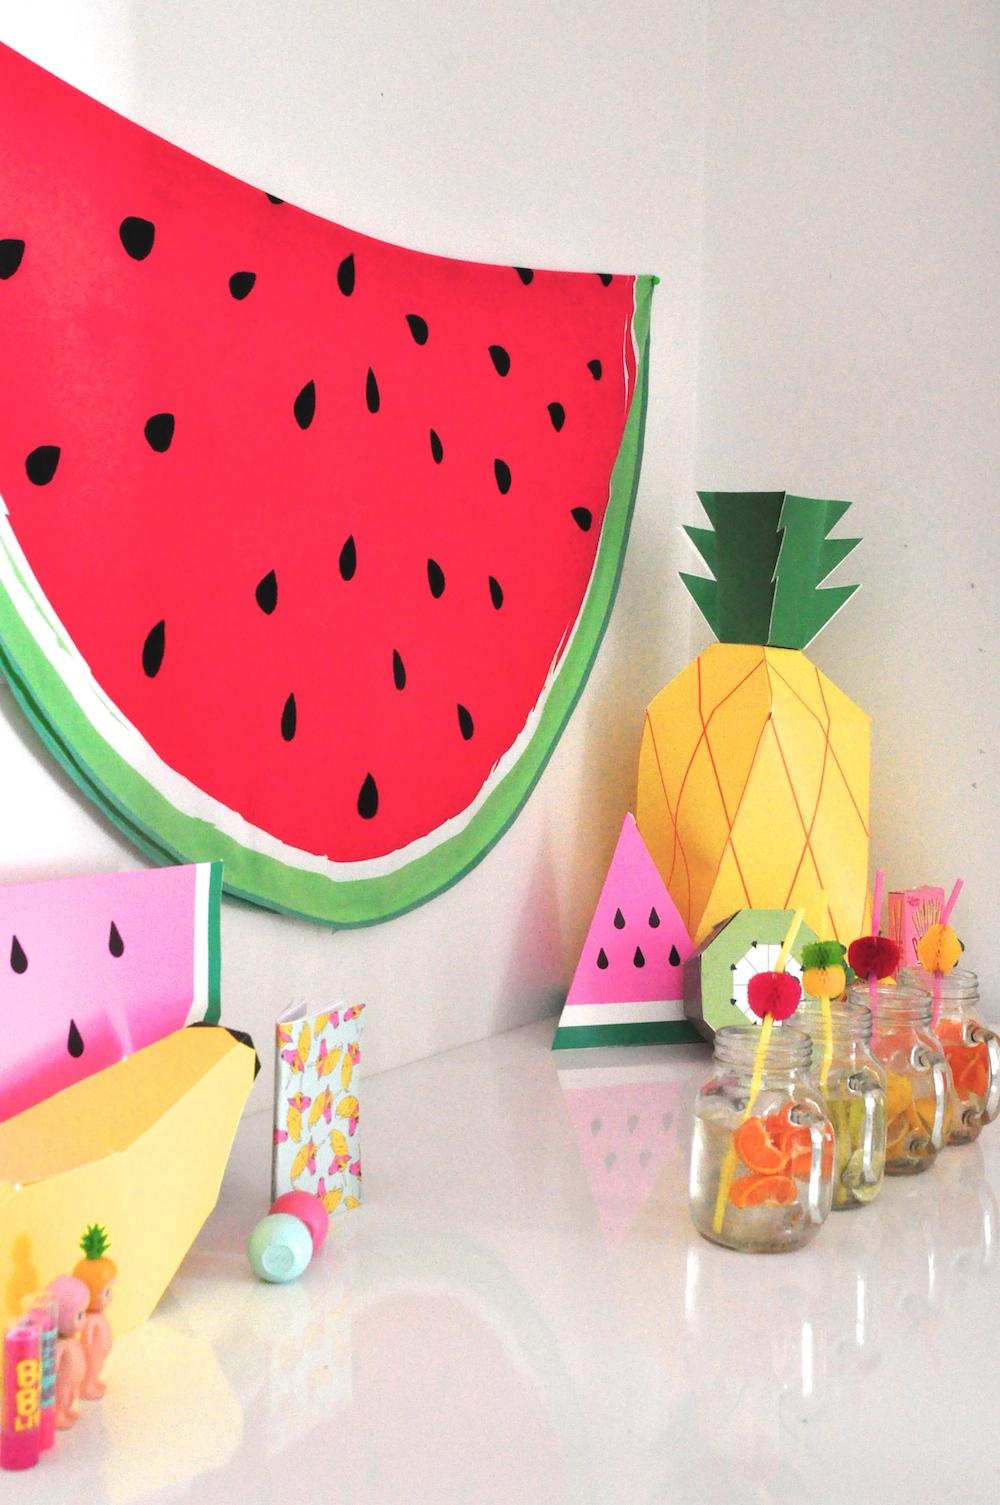 mr-printables_lyloh_sarong_watermelon_fruit_drinks